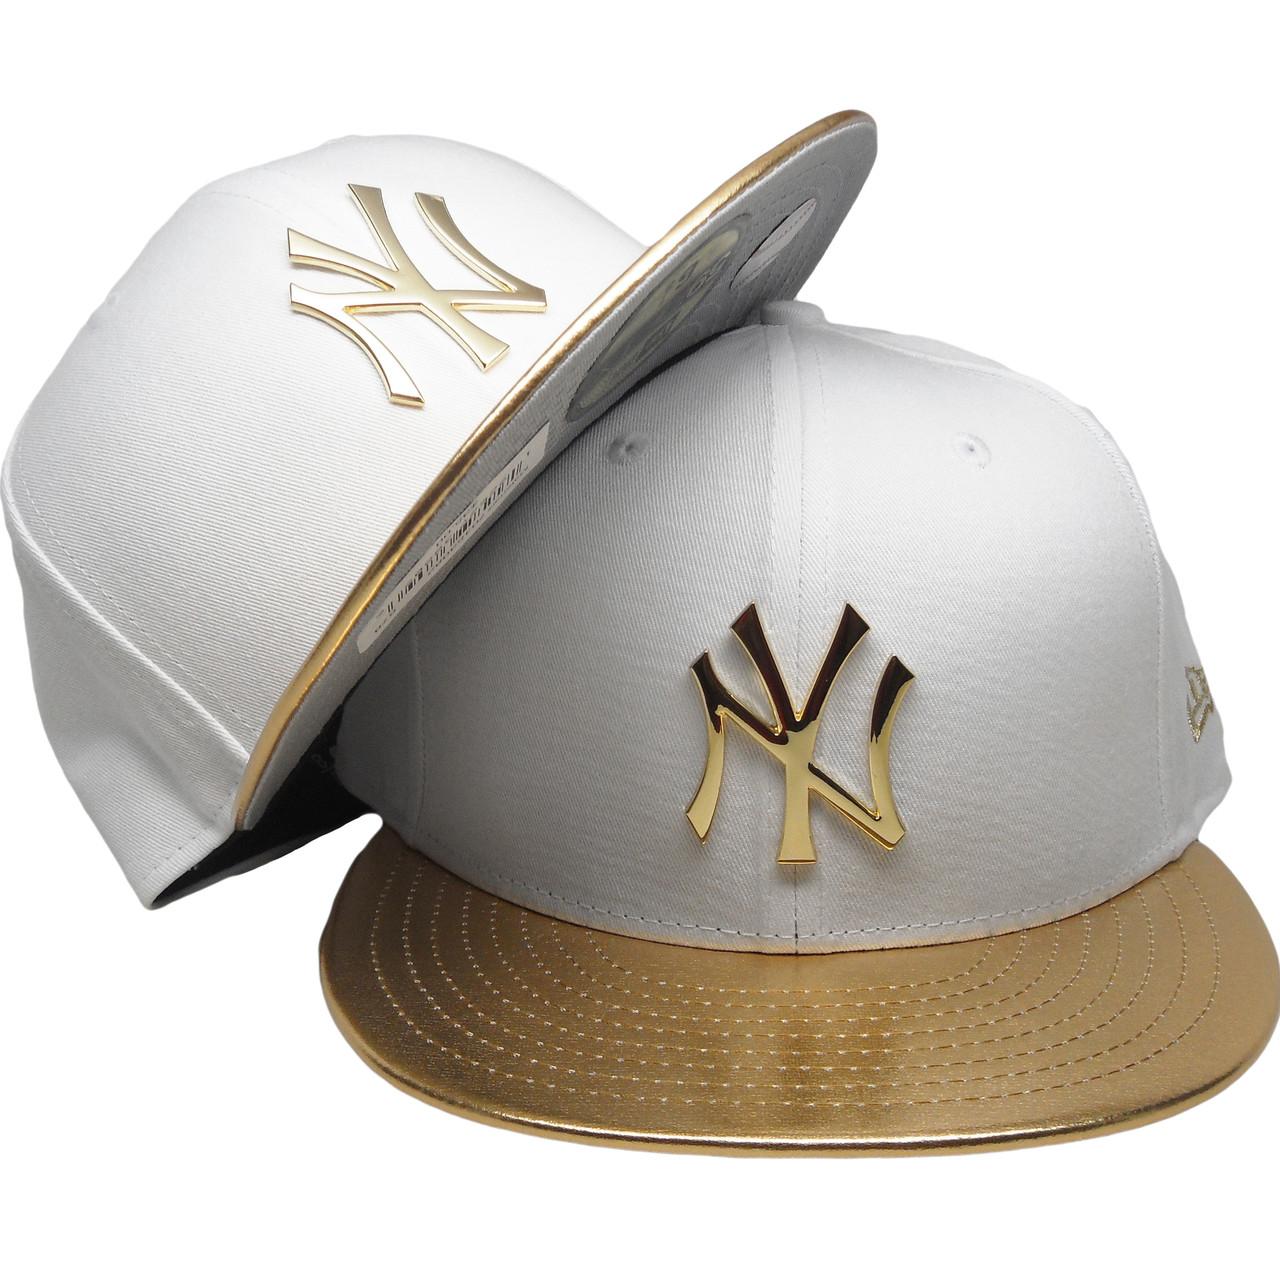 dffd2b26 New York Yankees New Era Custom 59Fifty Fitted - White, Gold Badge, Gold